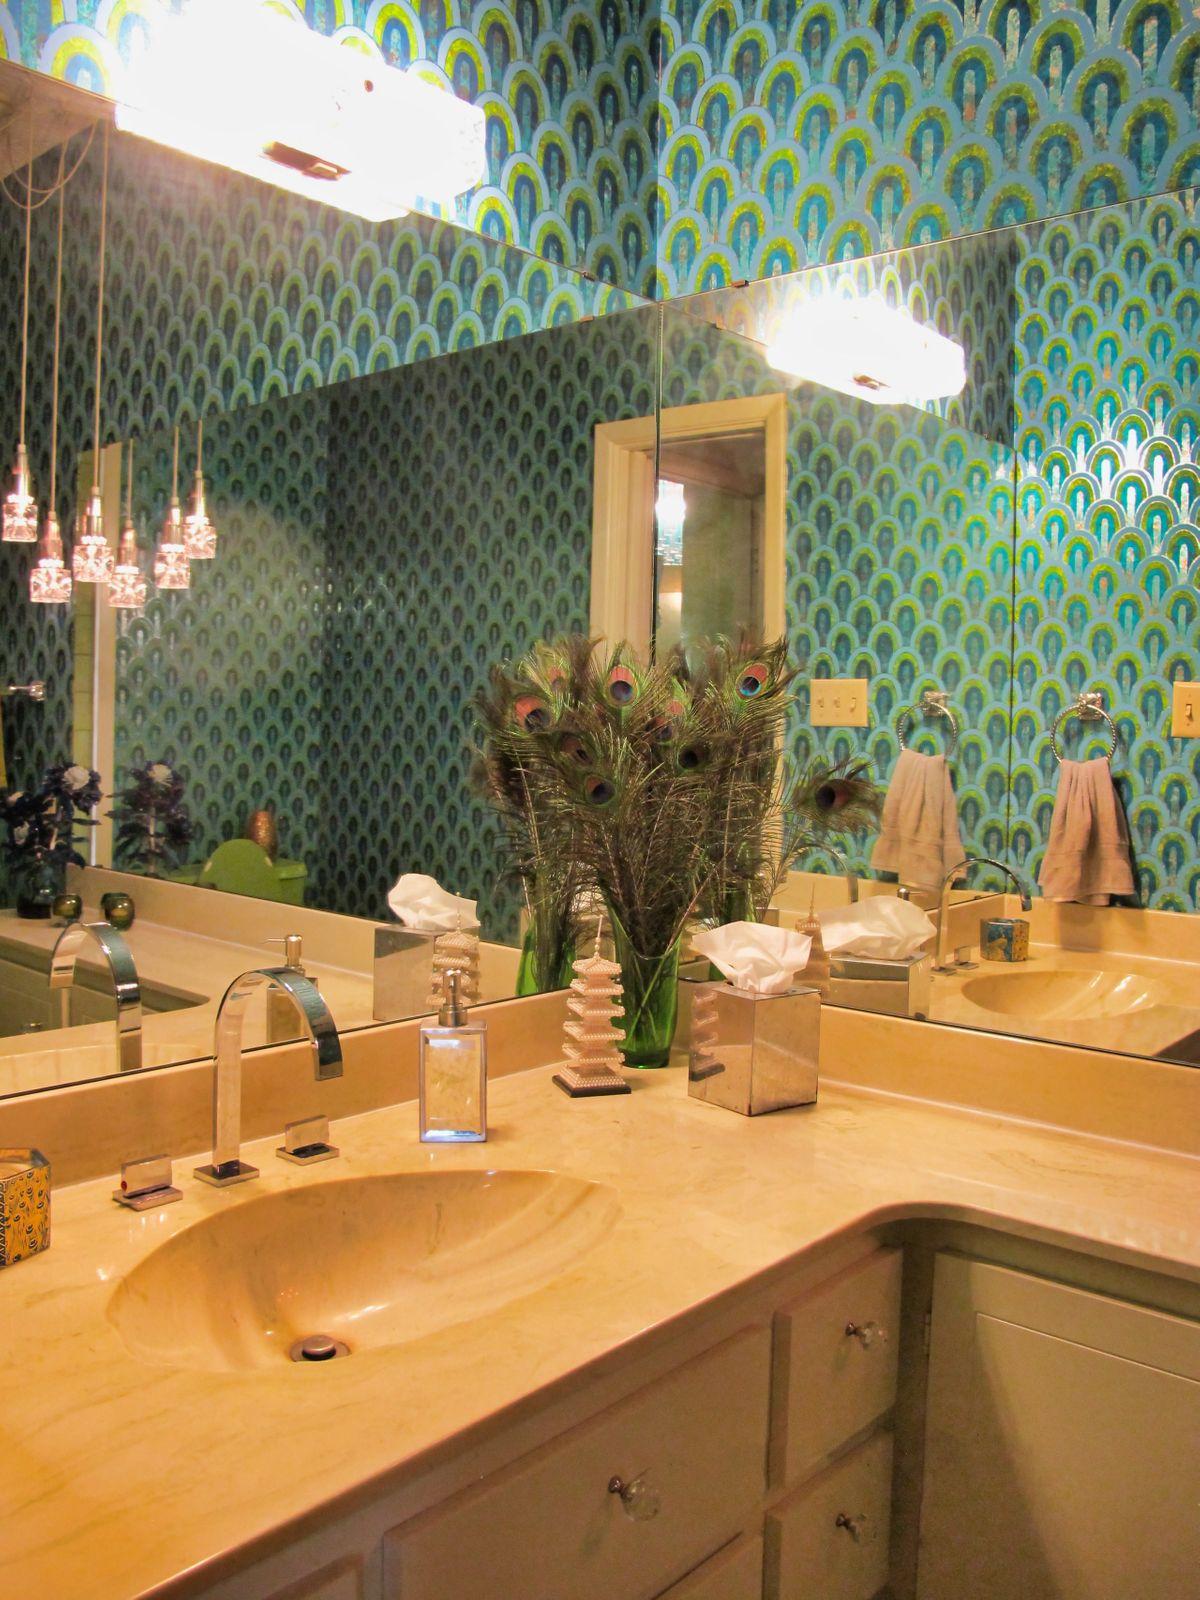 Shagplace Mid Century Modern Home Photo Video Shoot Location Dallas61.jpeg